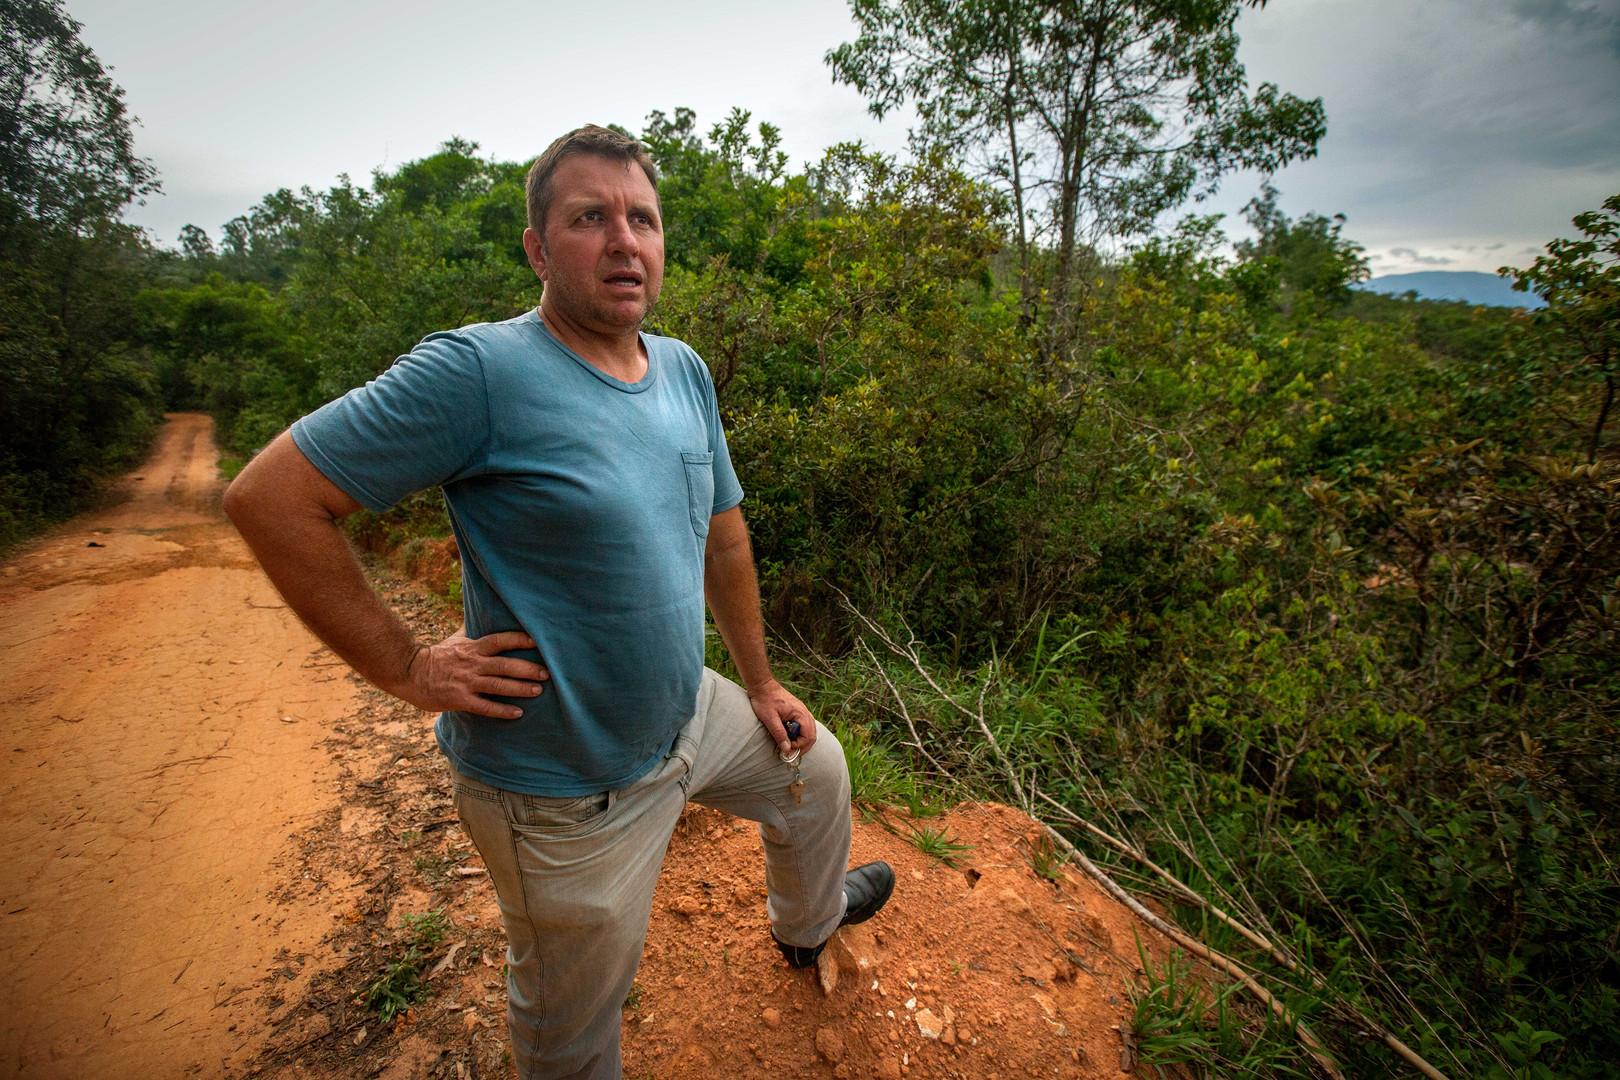 Mariana-Brazil-Mudslides-Man-Talking.jpg